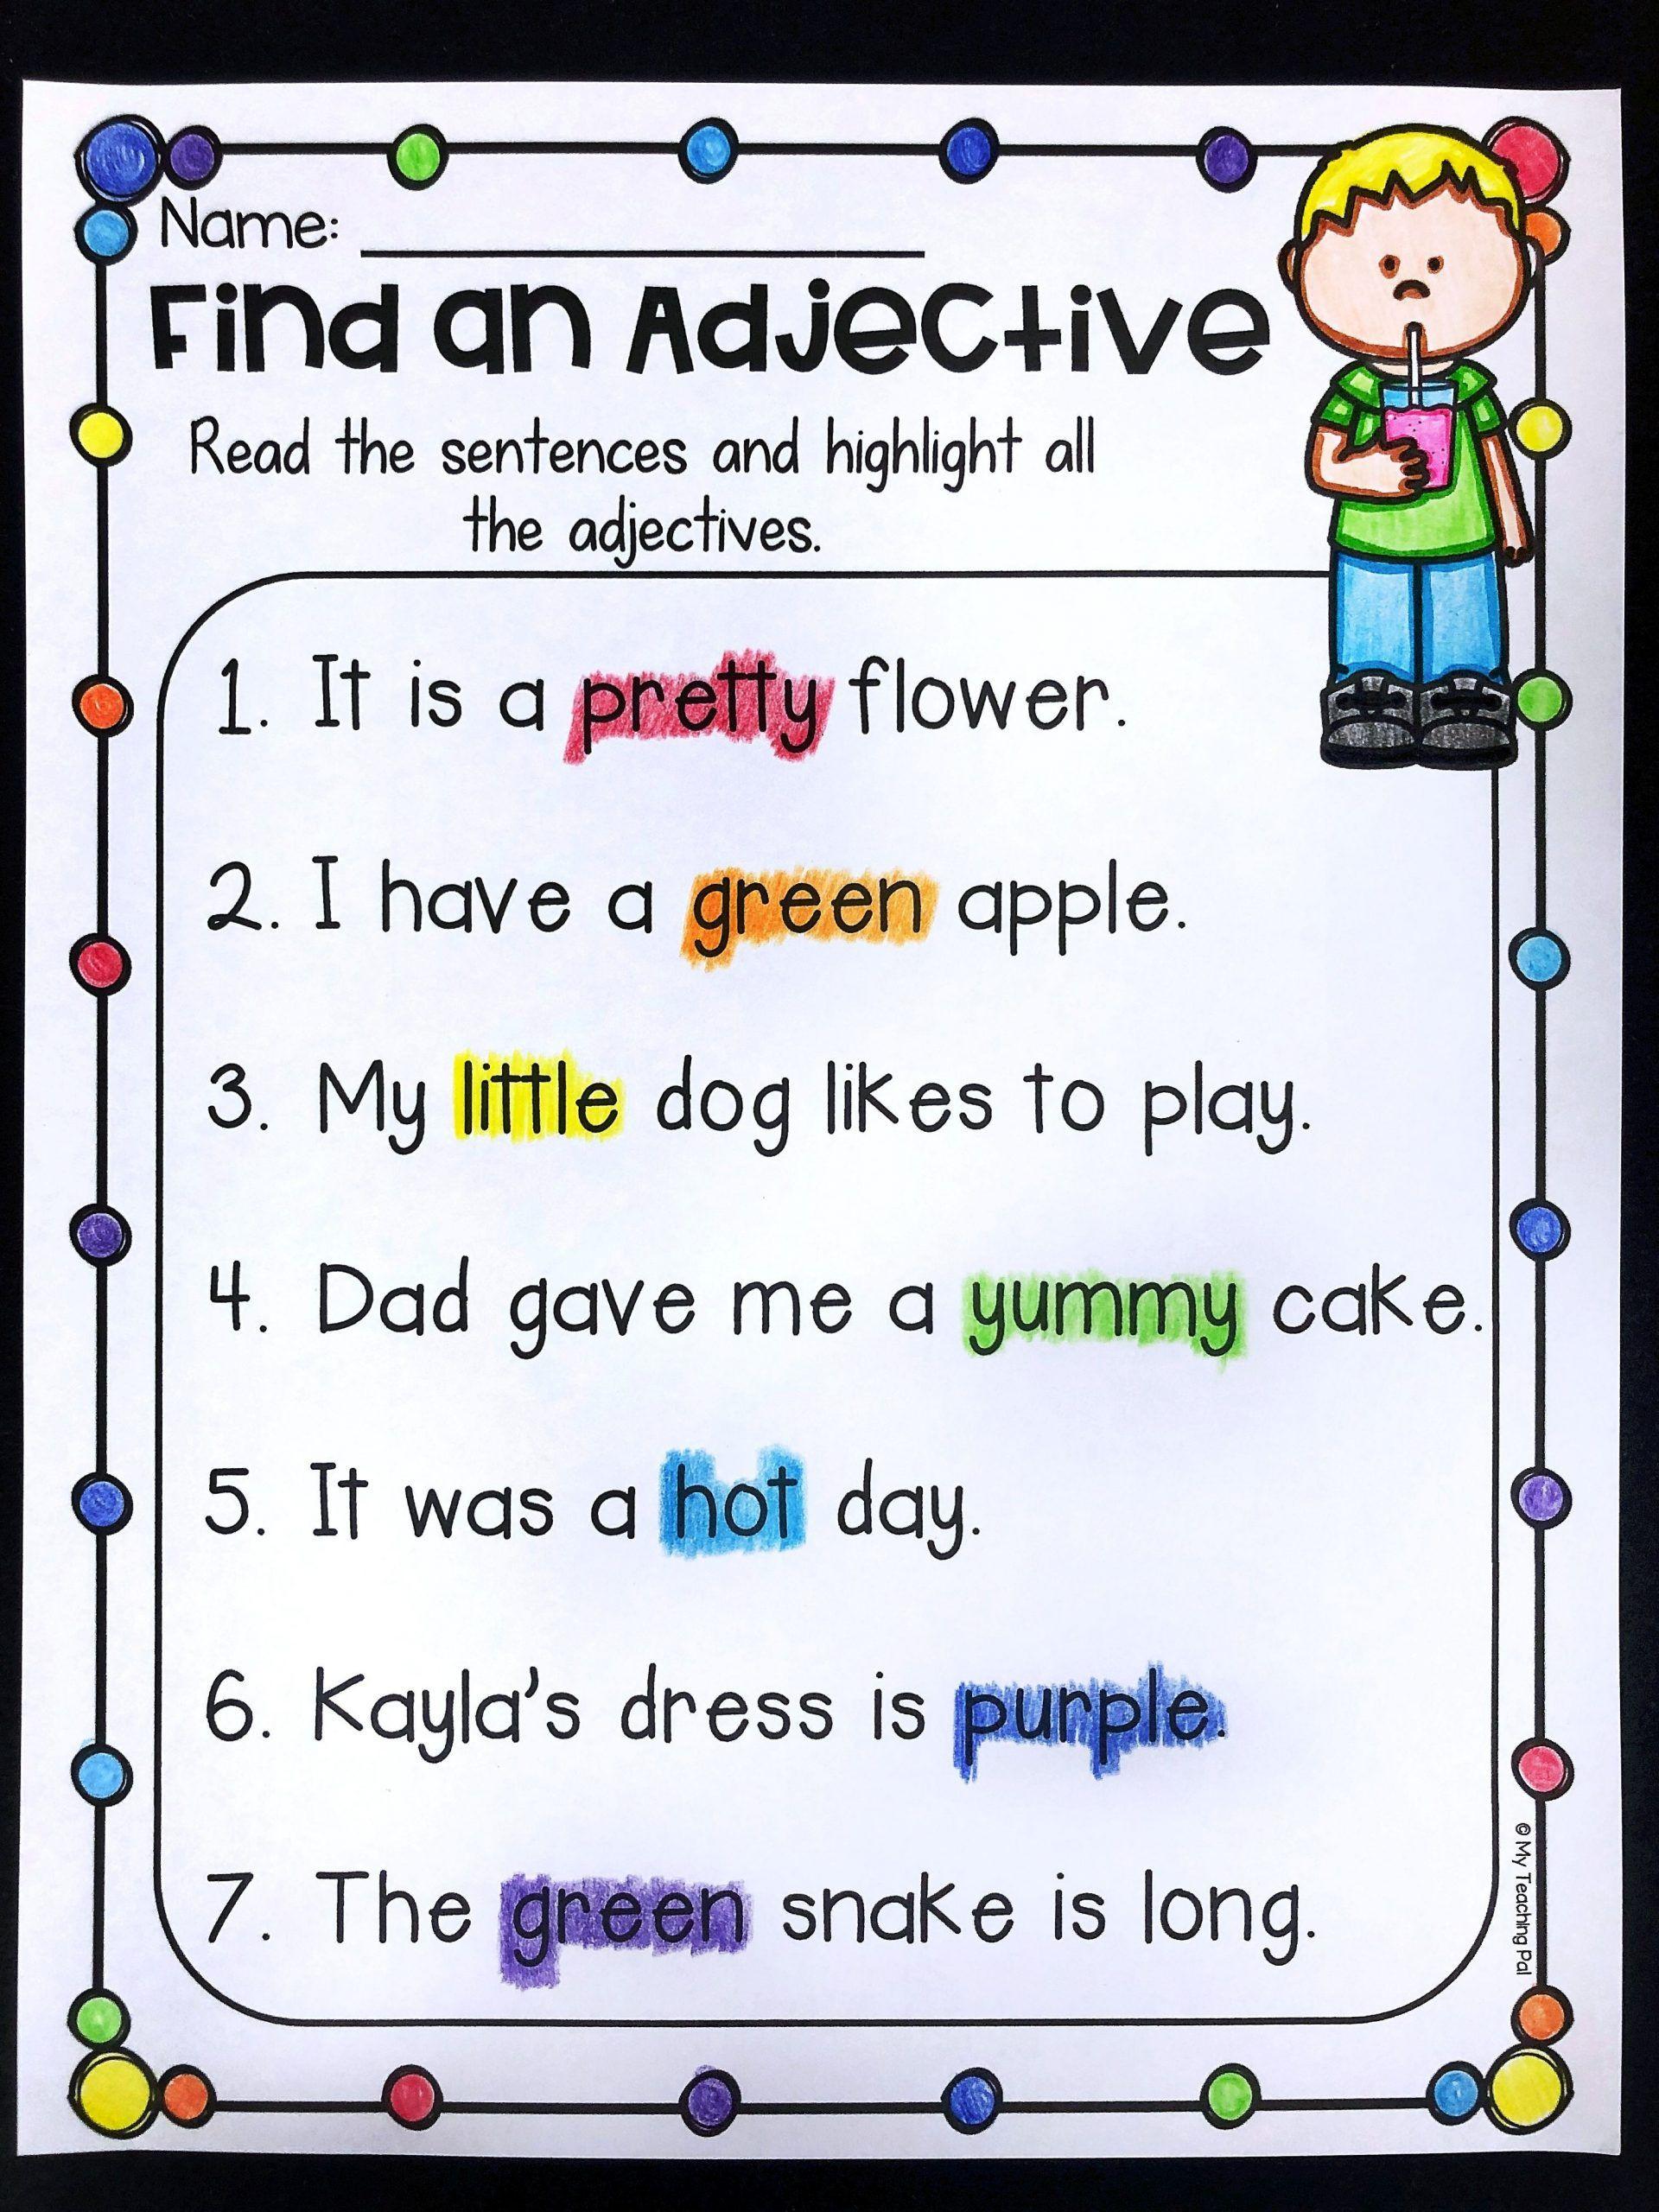 Nouns Verbs Adjectives Worksheet 20 Noun Verb Adjective Worksheet In 2020